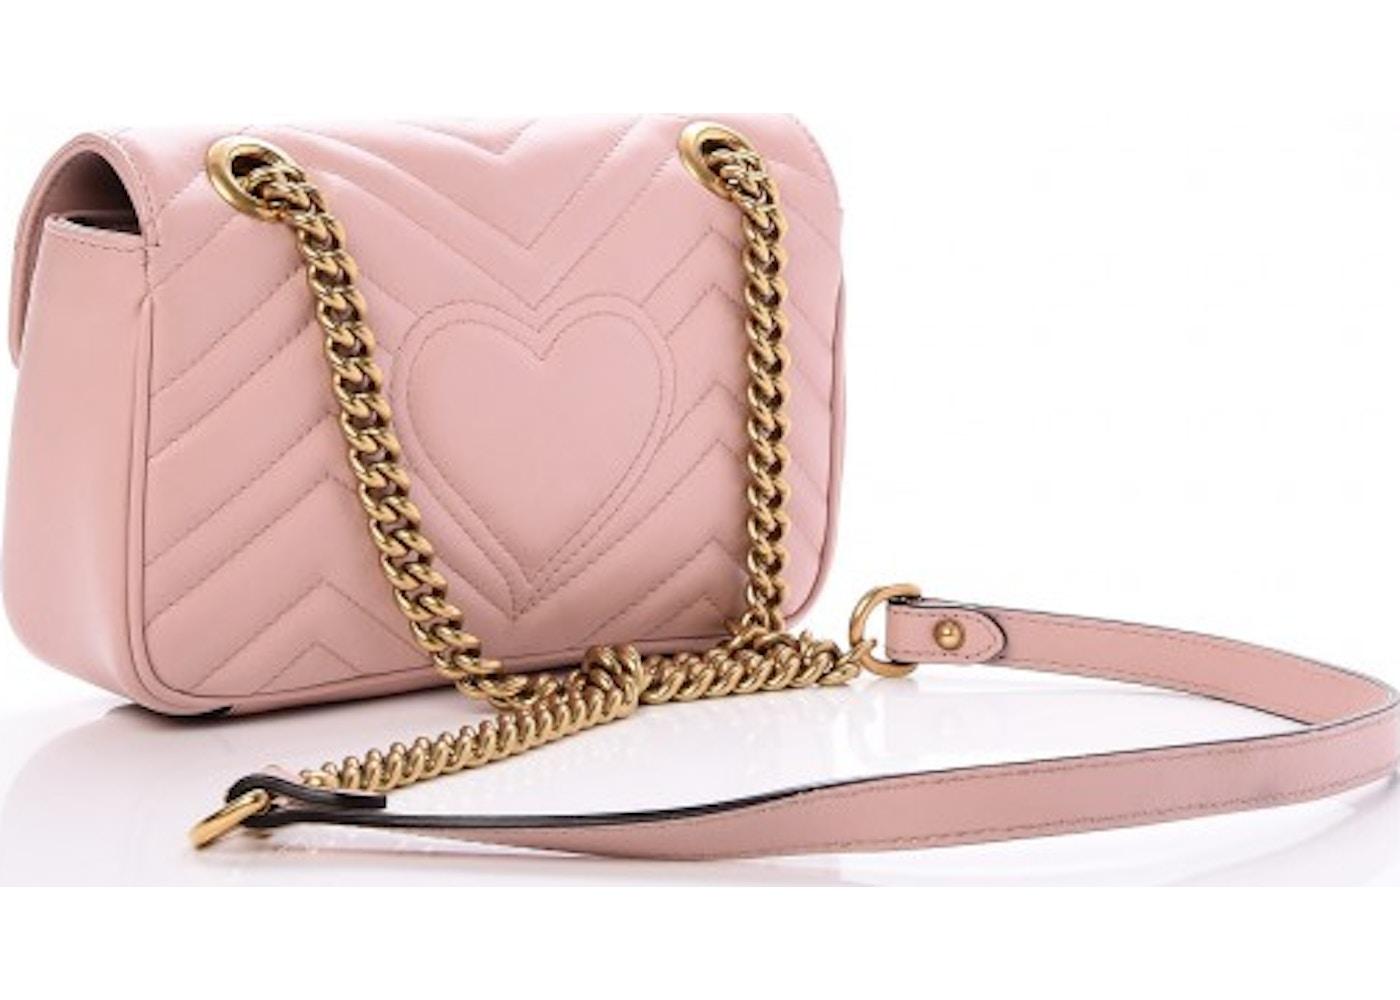 cb75ef1cfba Gucci Marmont Matelasse GG Mini Light Pink